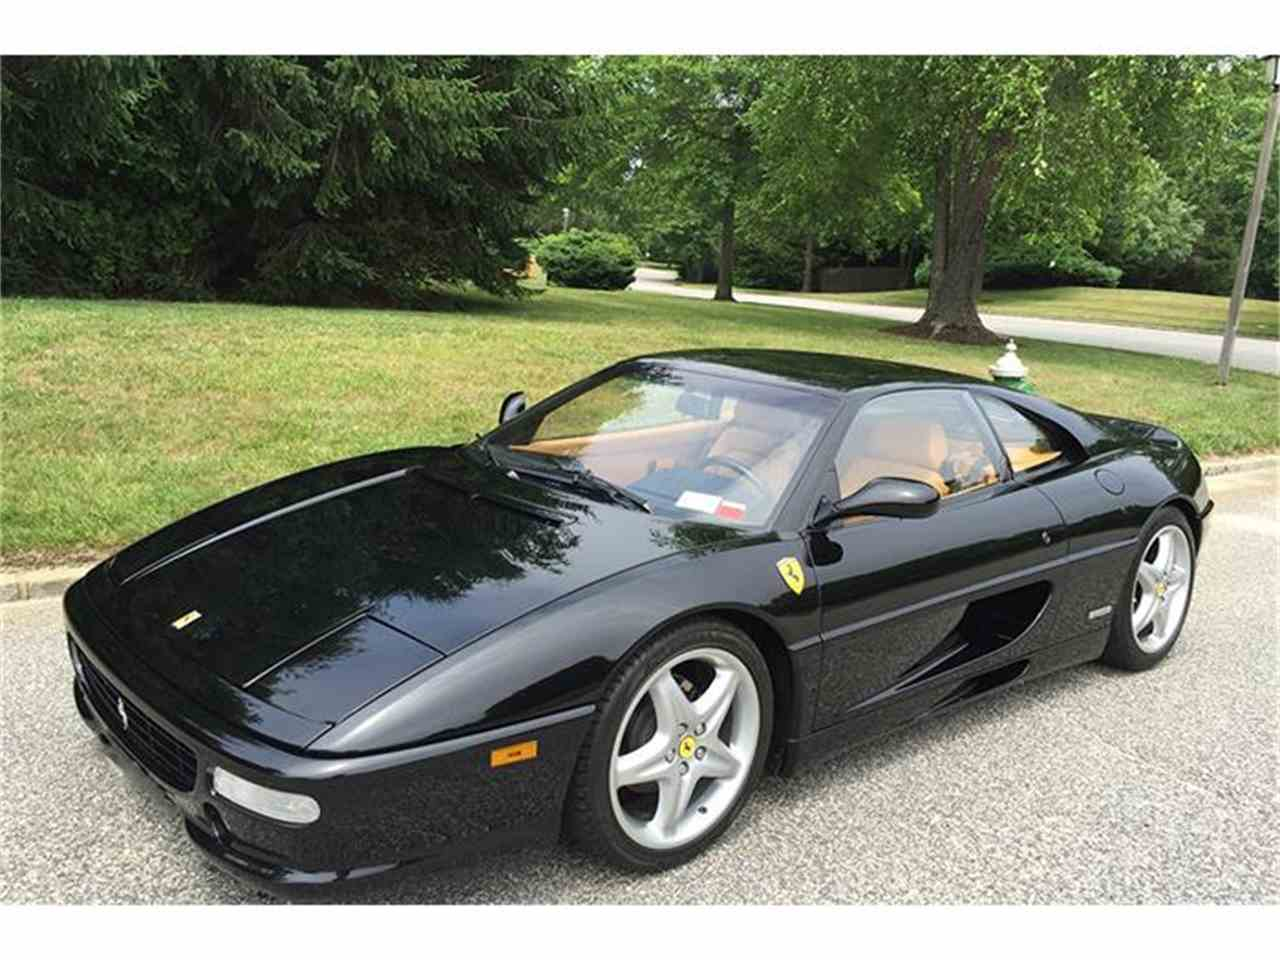 Large Picture of '97 Ferrari 355 located in Southampton New York - $105,000.00 - IX8X